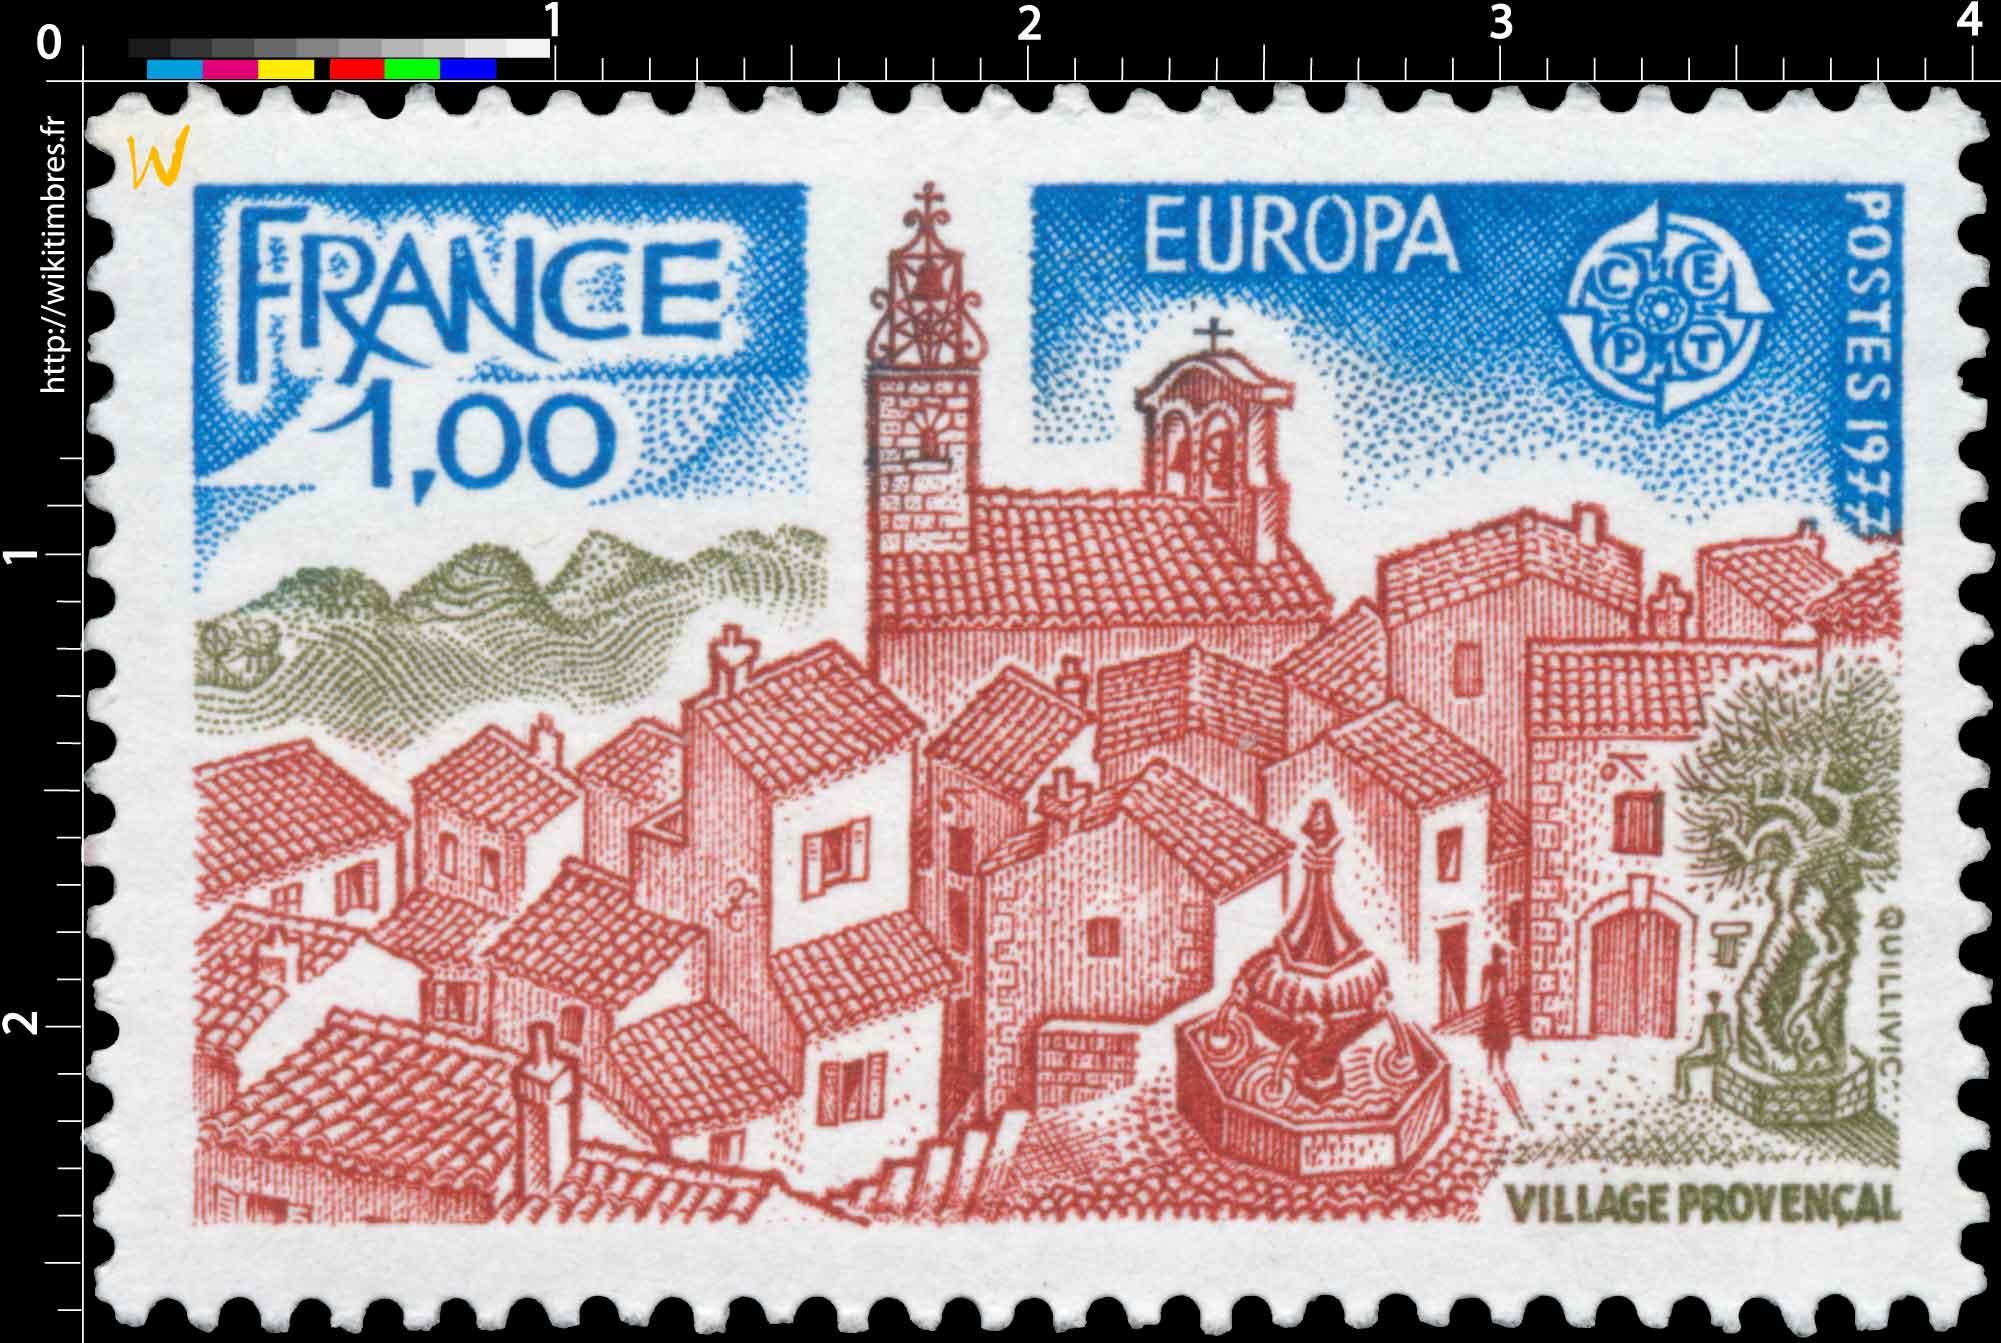 1977 EUROPA CEPT VILLAGE PROVENÇAL